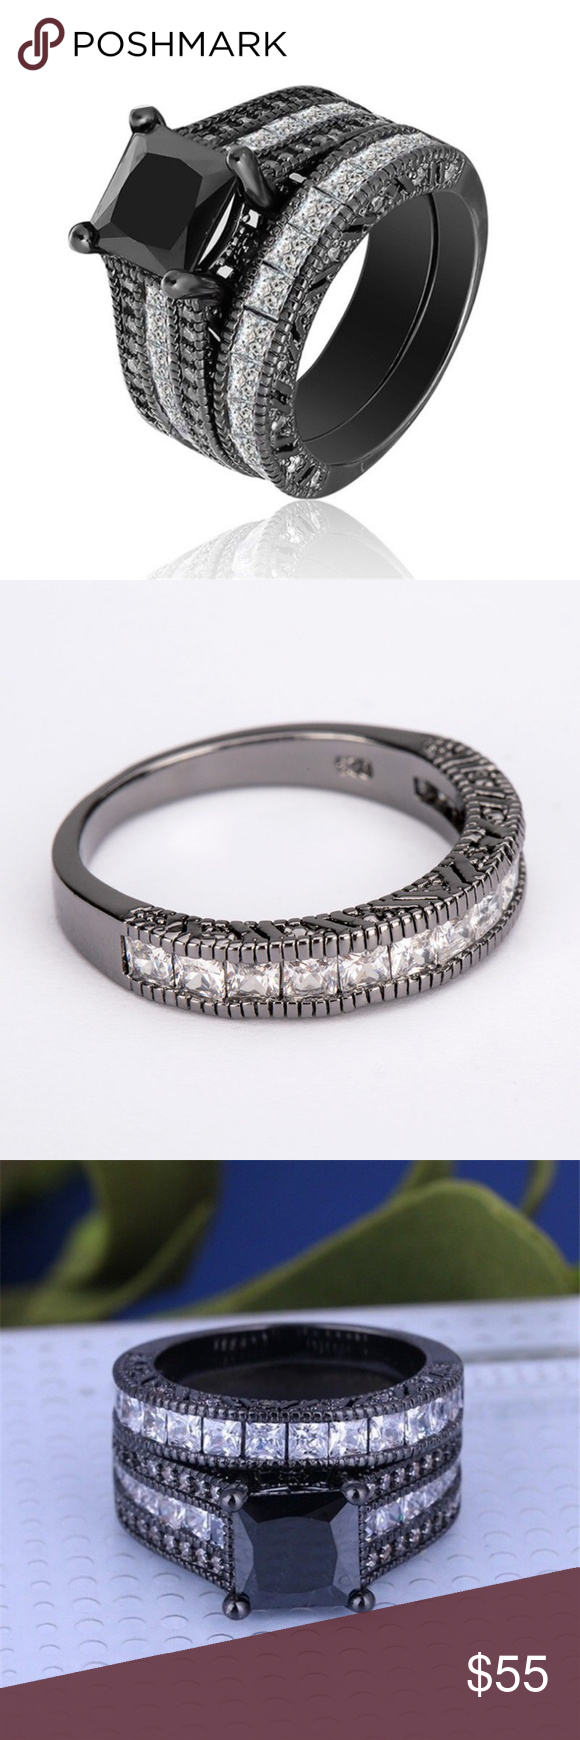 Black Sapphire Elegant Wedding 2pcs Ring Size 7 Black